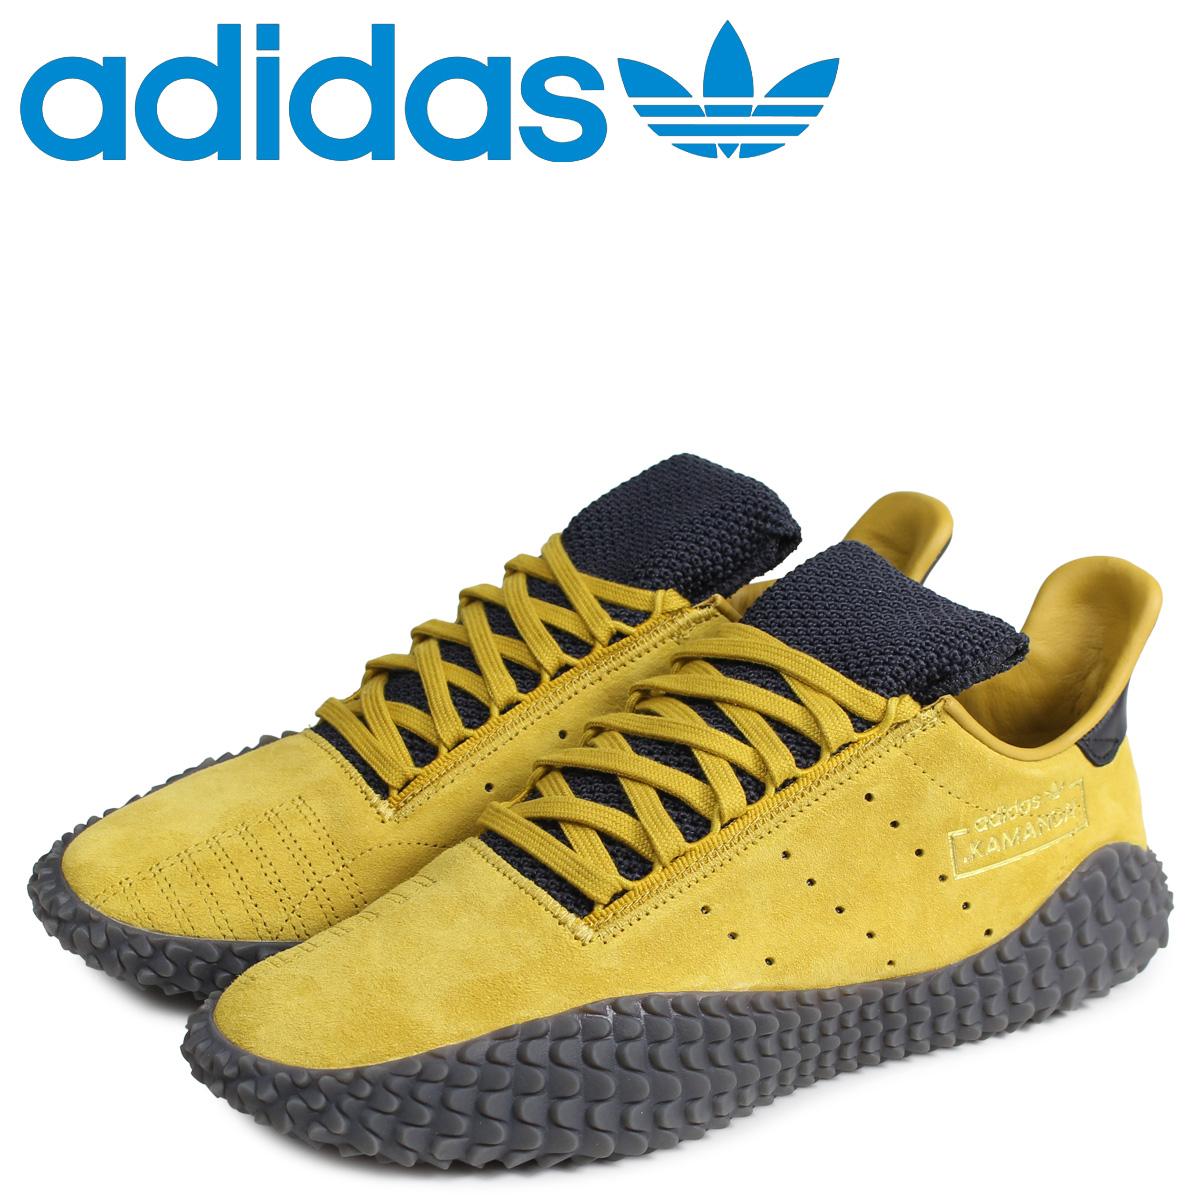 adidas Originals アディダス オリジナルス カマンダ スニーカー メンズ KAMANDA イエロー G27712